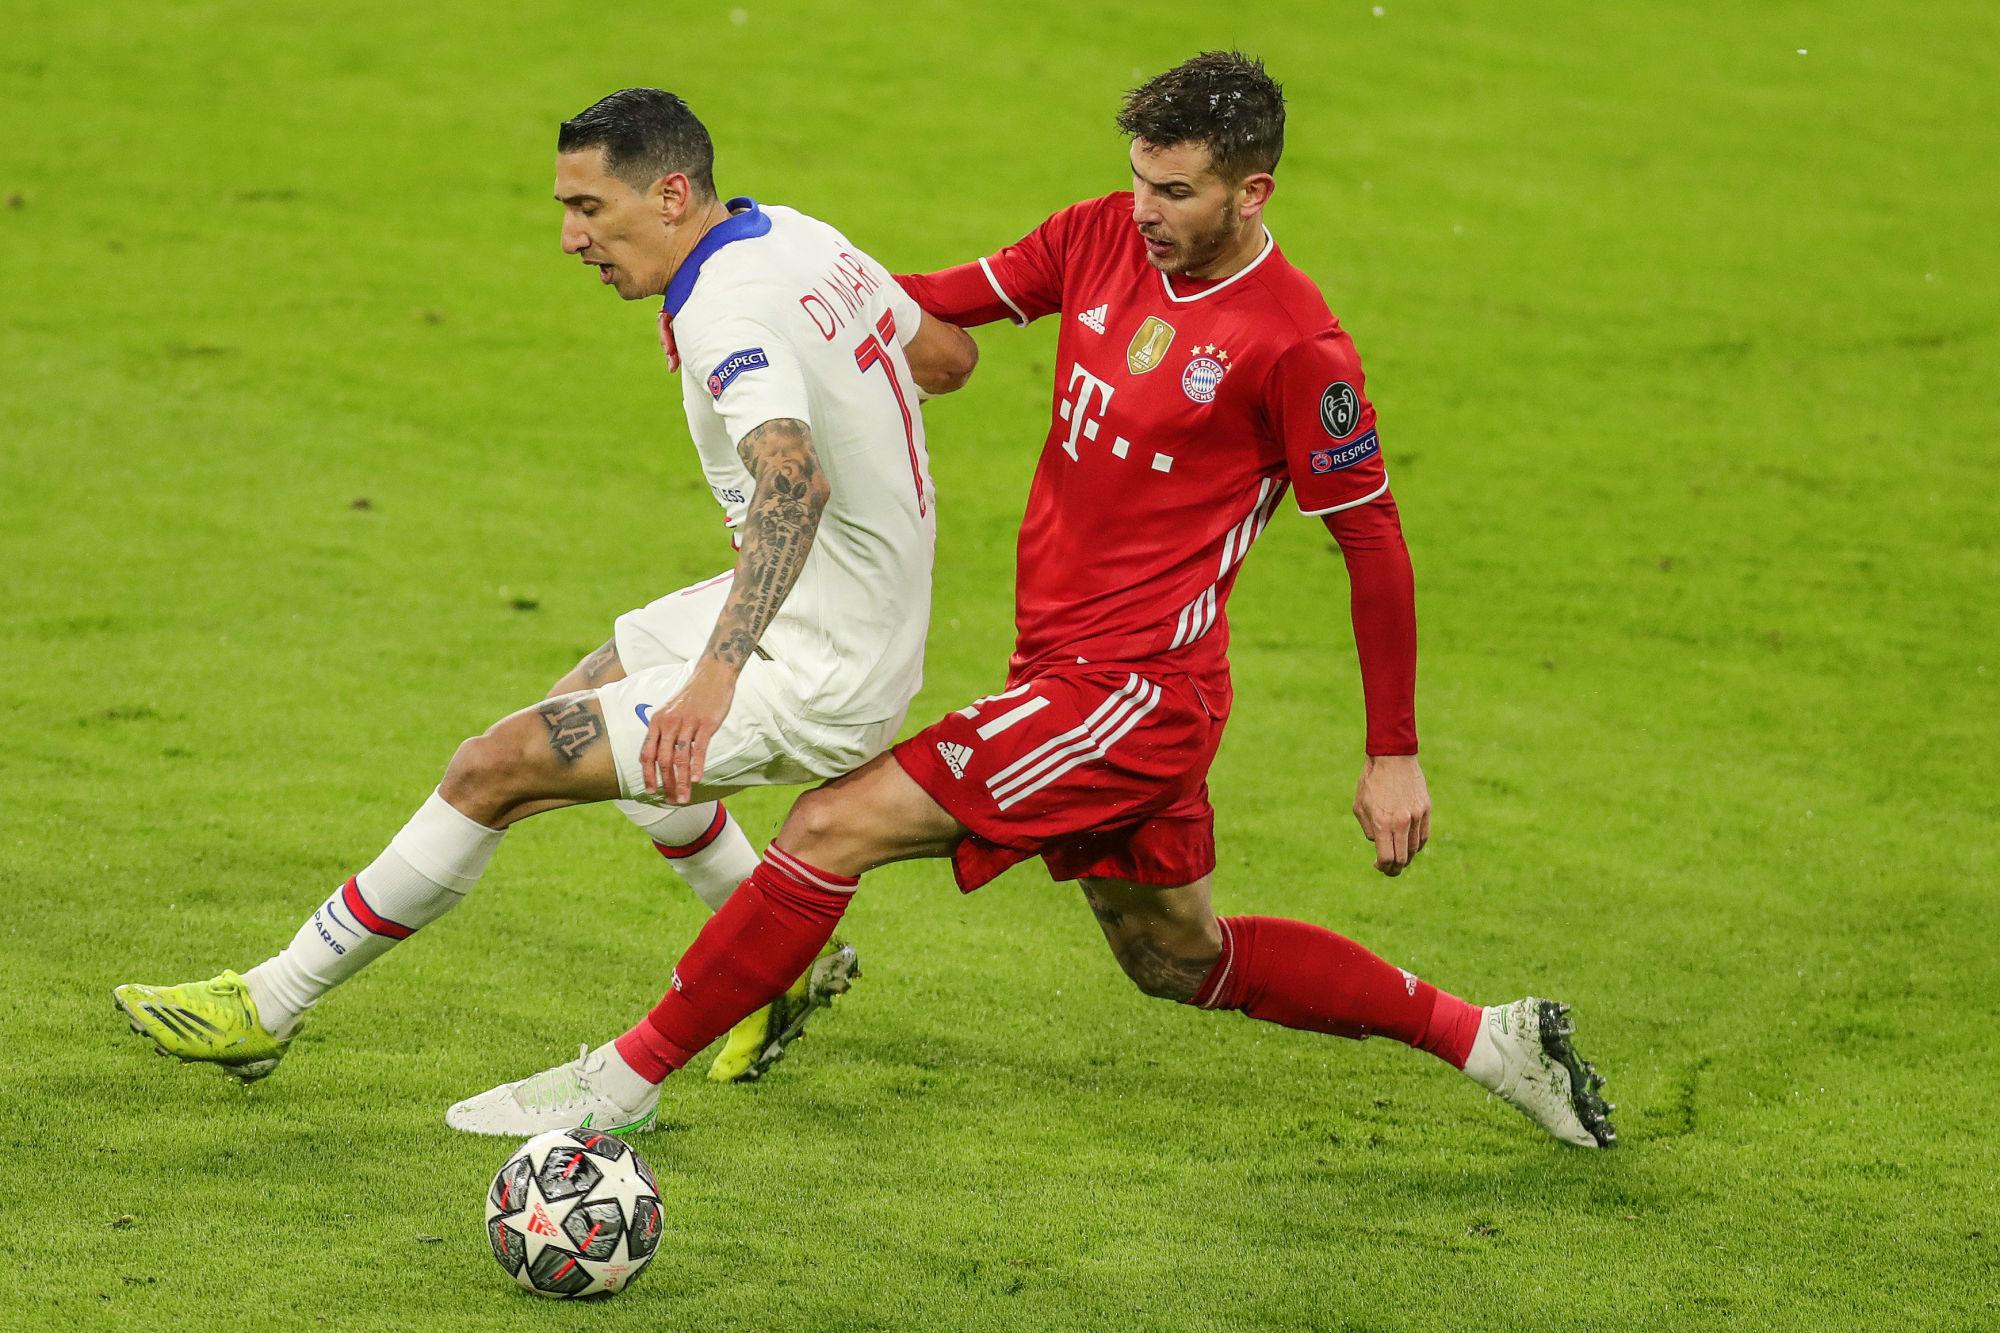 PSG/Bayern - Hernandez veut être «impitoyable», avec le PSG